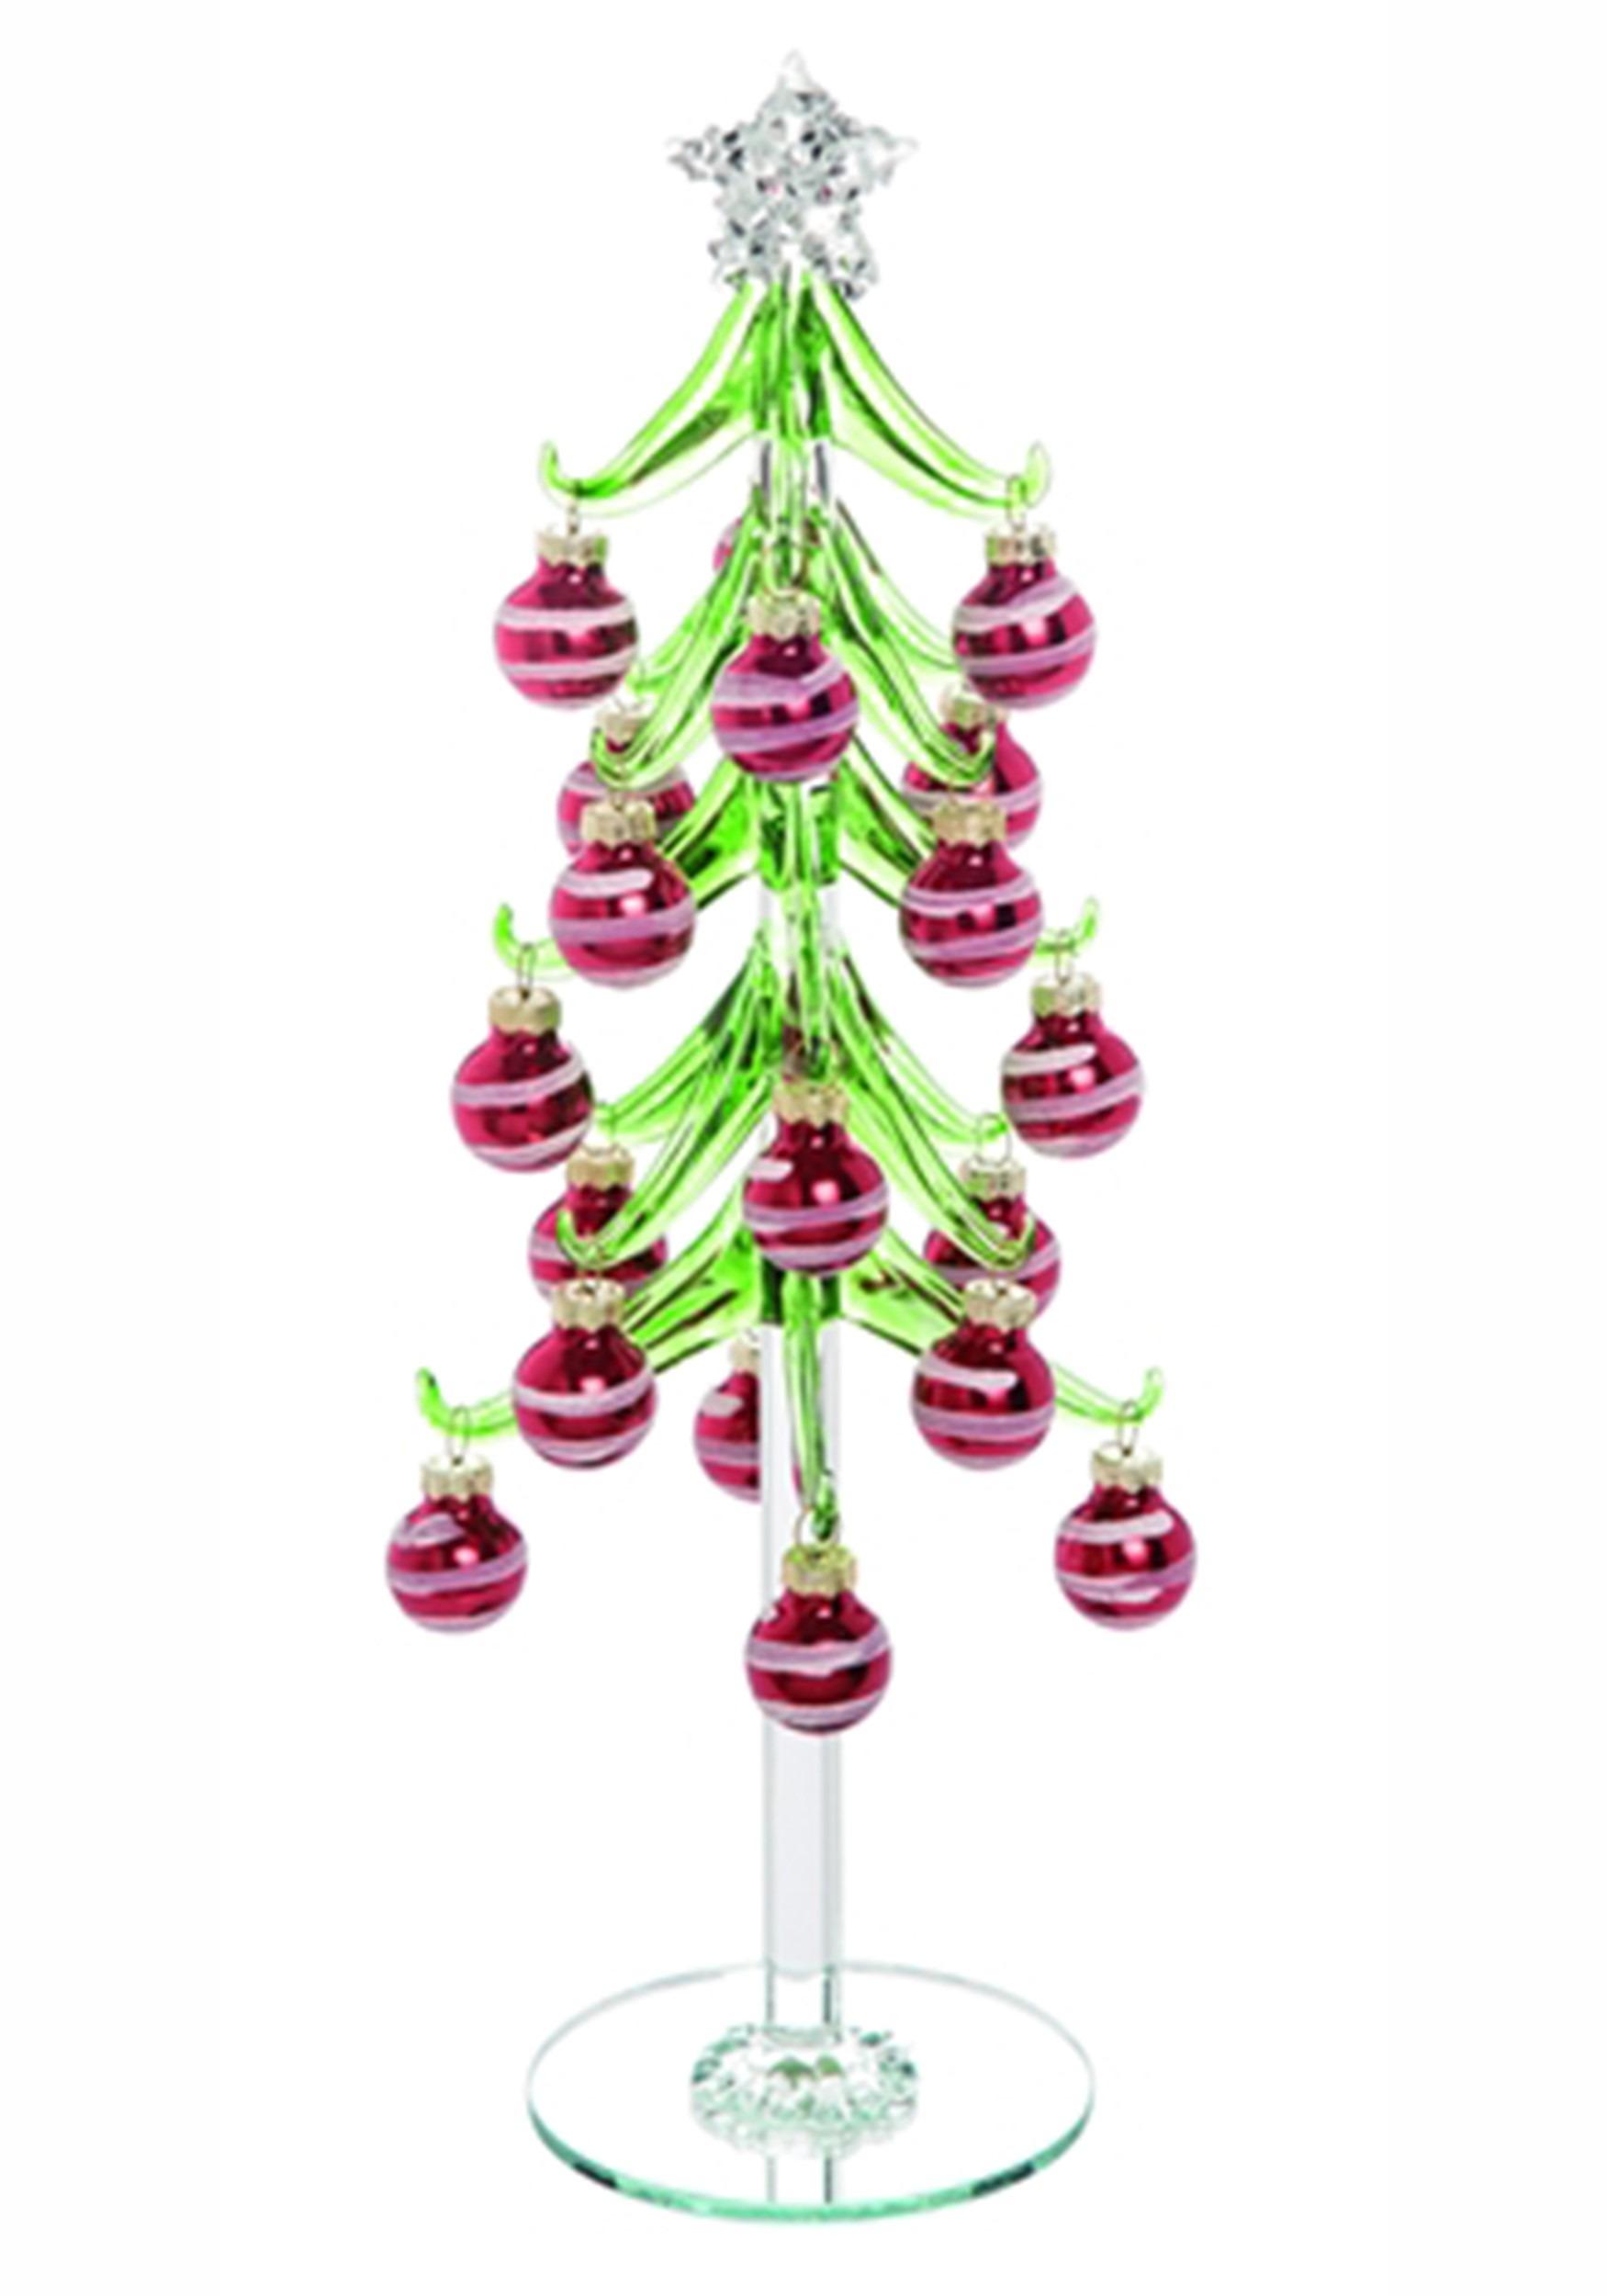 Trinket Ornament Tree Glass Christmas Décor